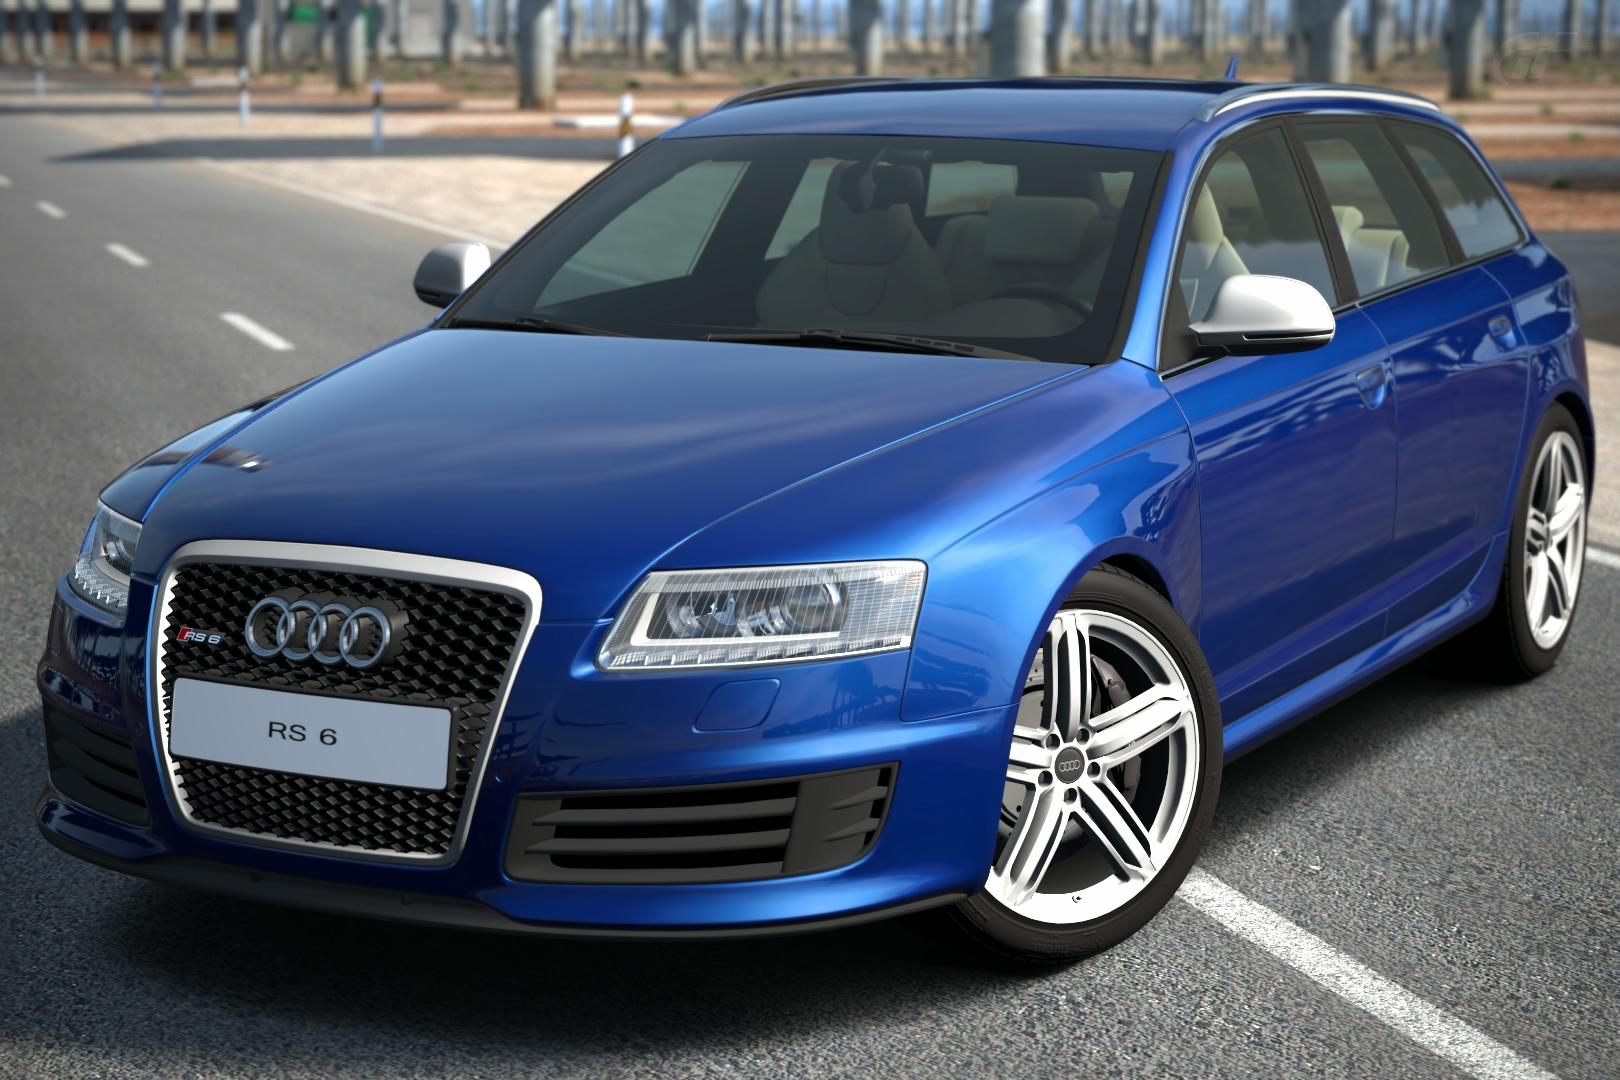 Audi RS 6 Avant '08